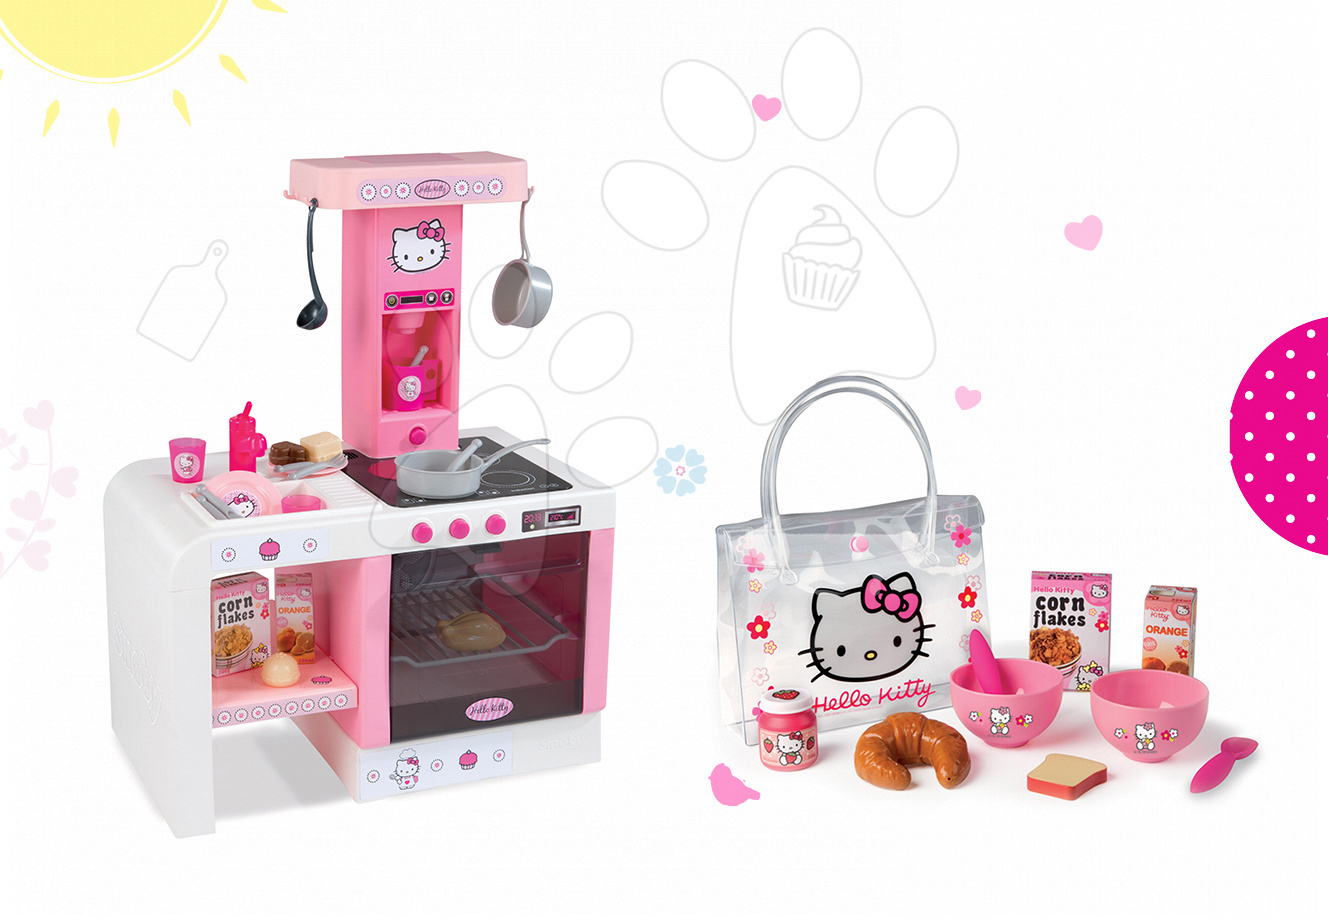 Komplet kuhinja Hello Kitty Cheftronic Smoby z zvoki in komplet za zajtrk v torbici